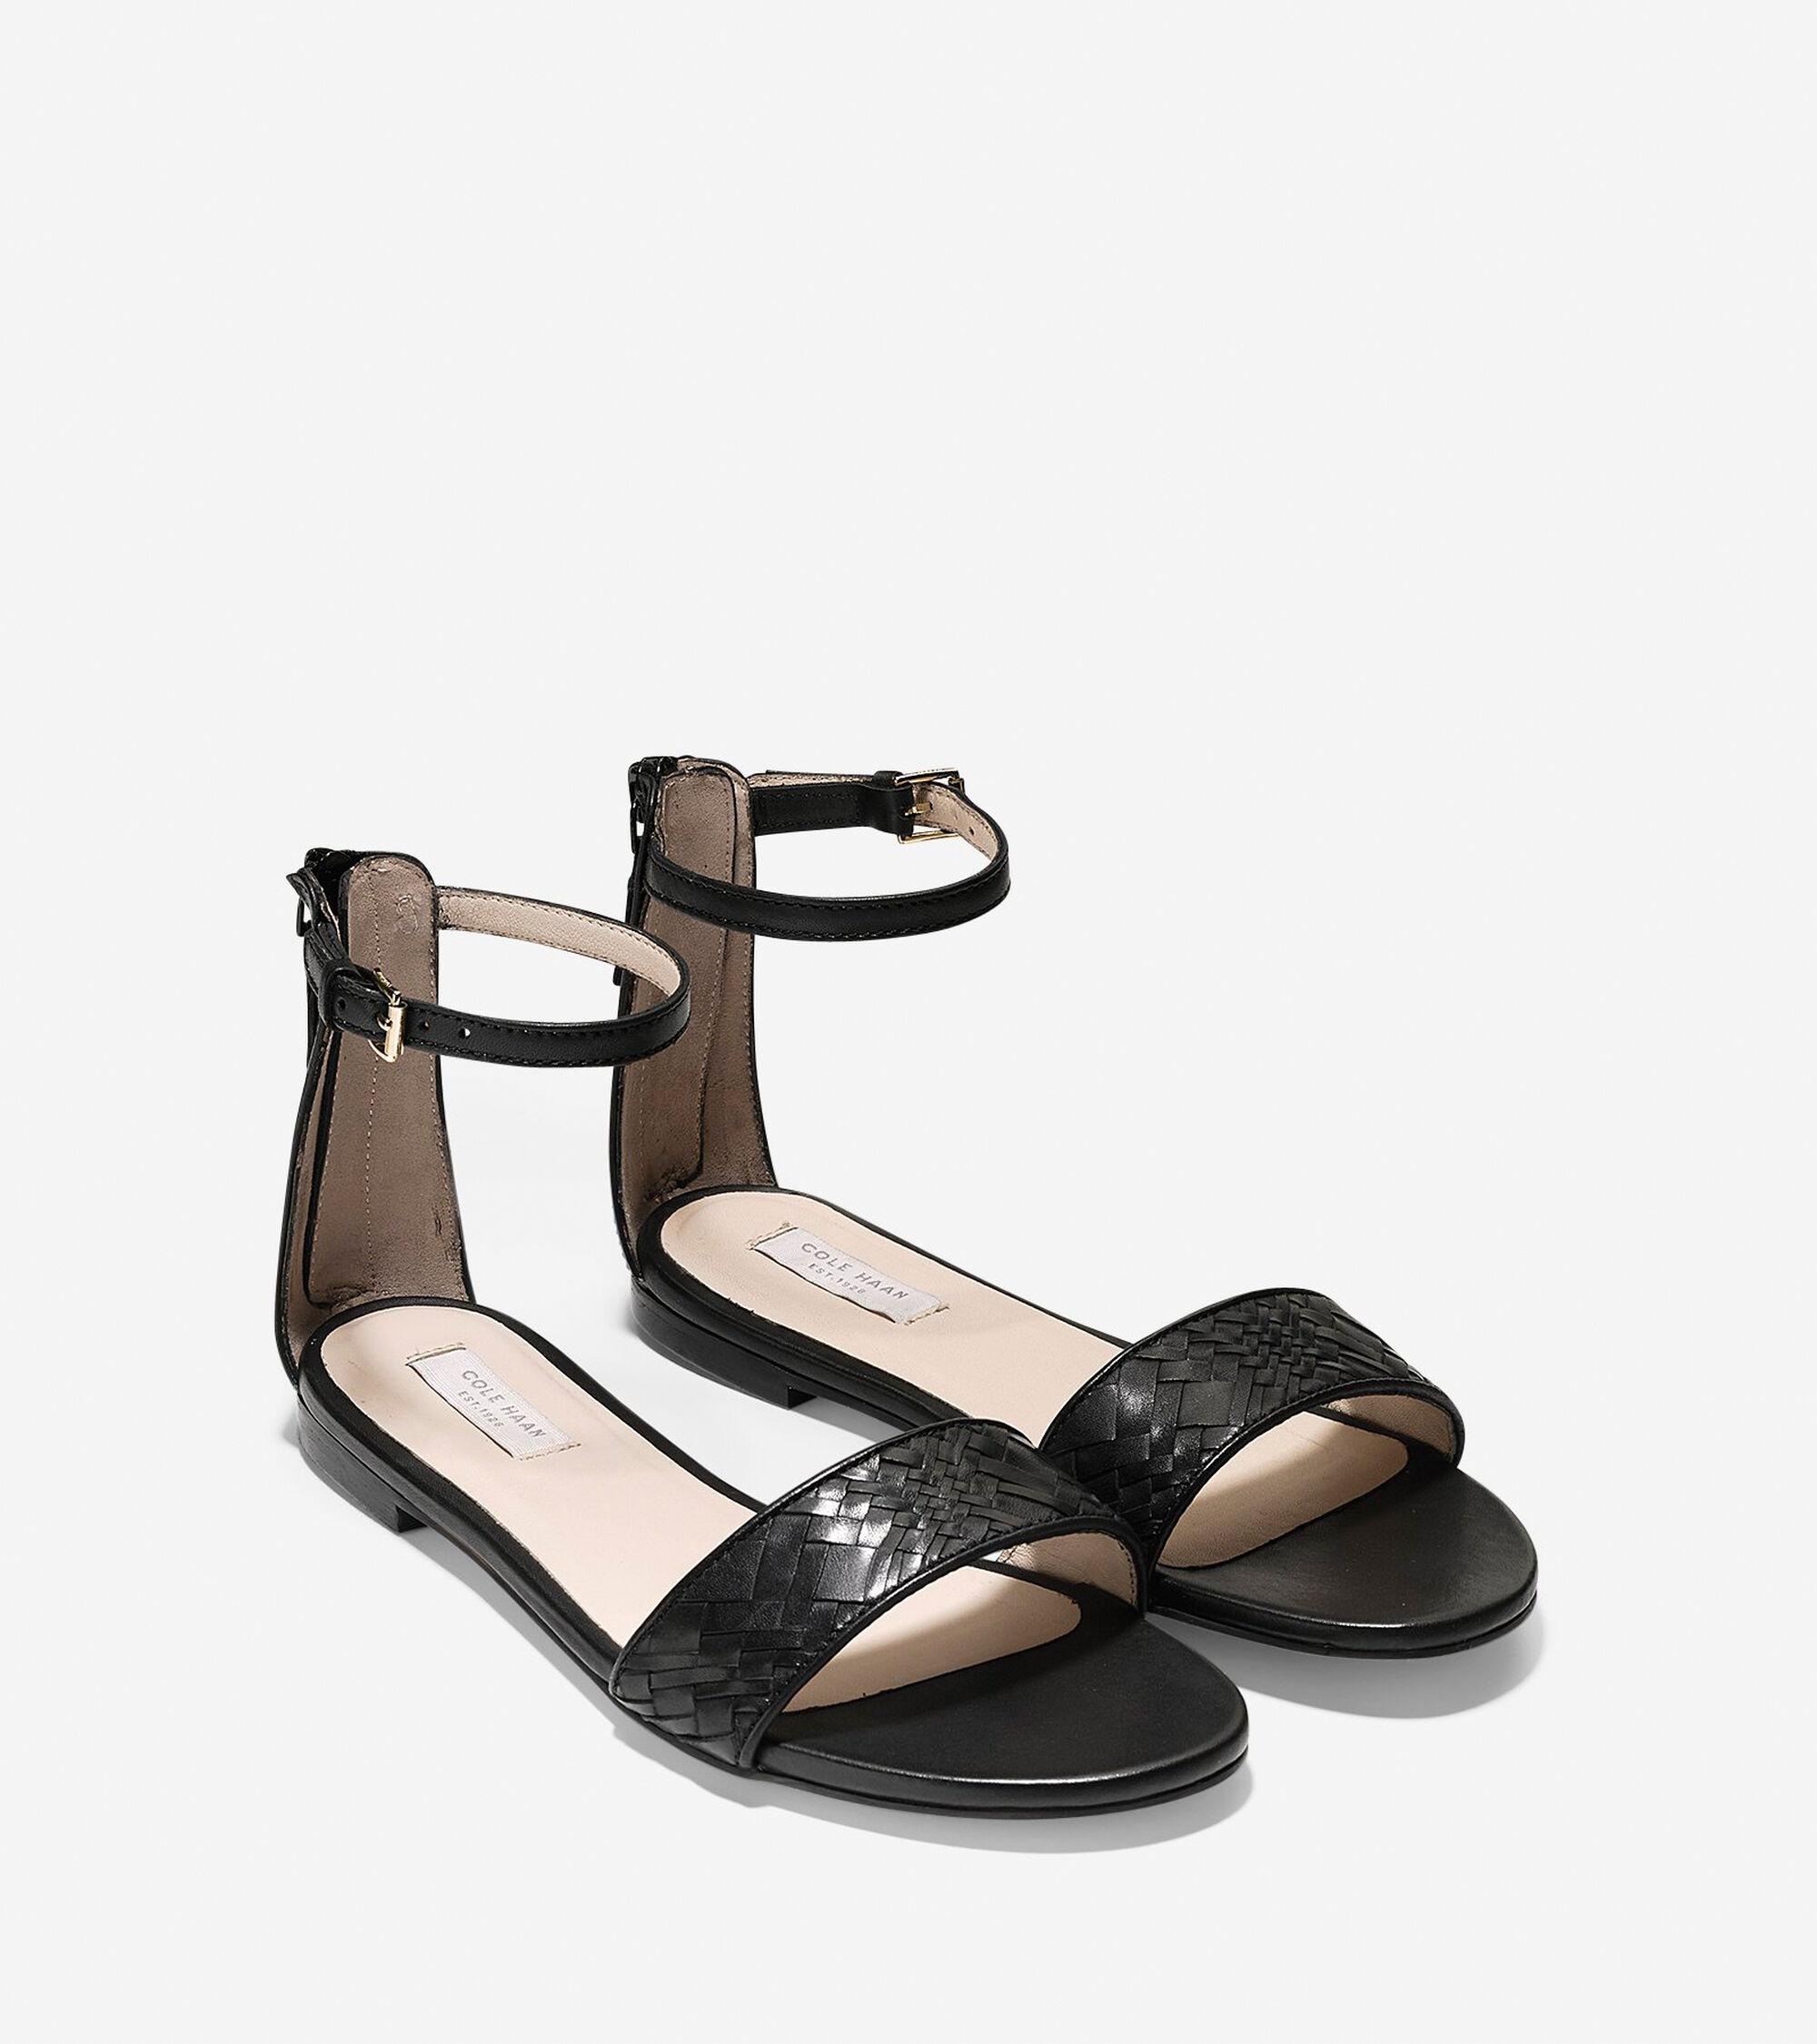 Flat sandals -  Genevieve Weave Flat Sandal